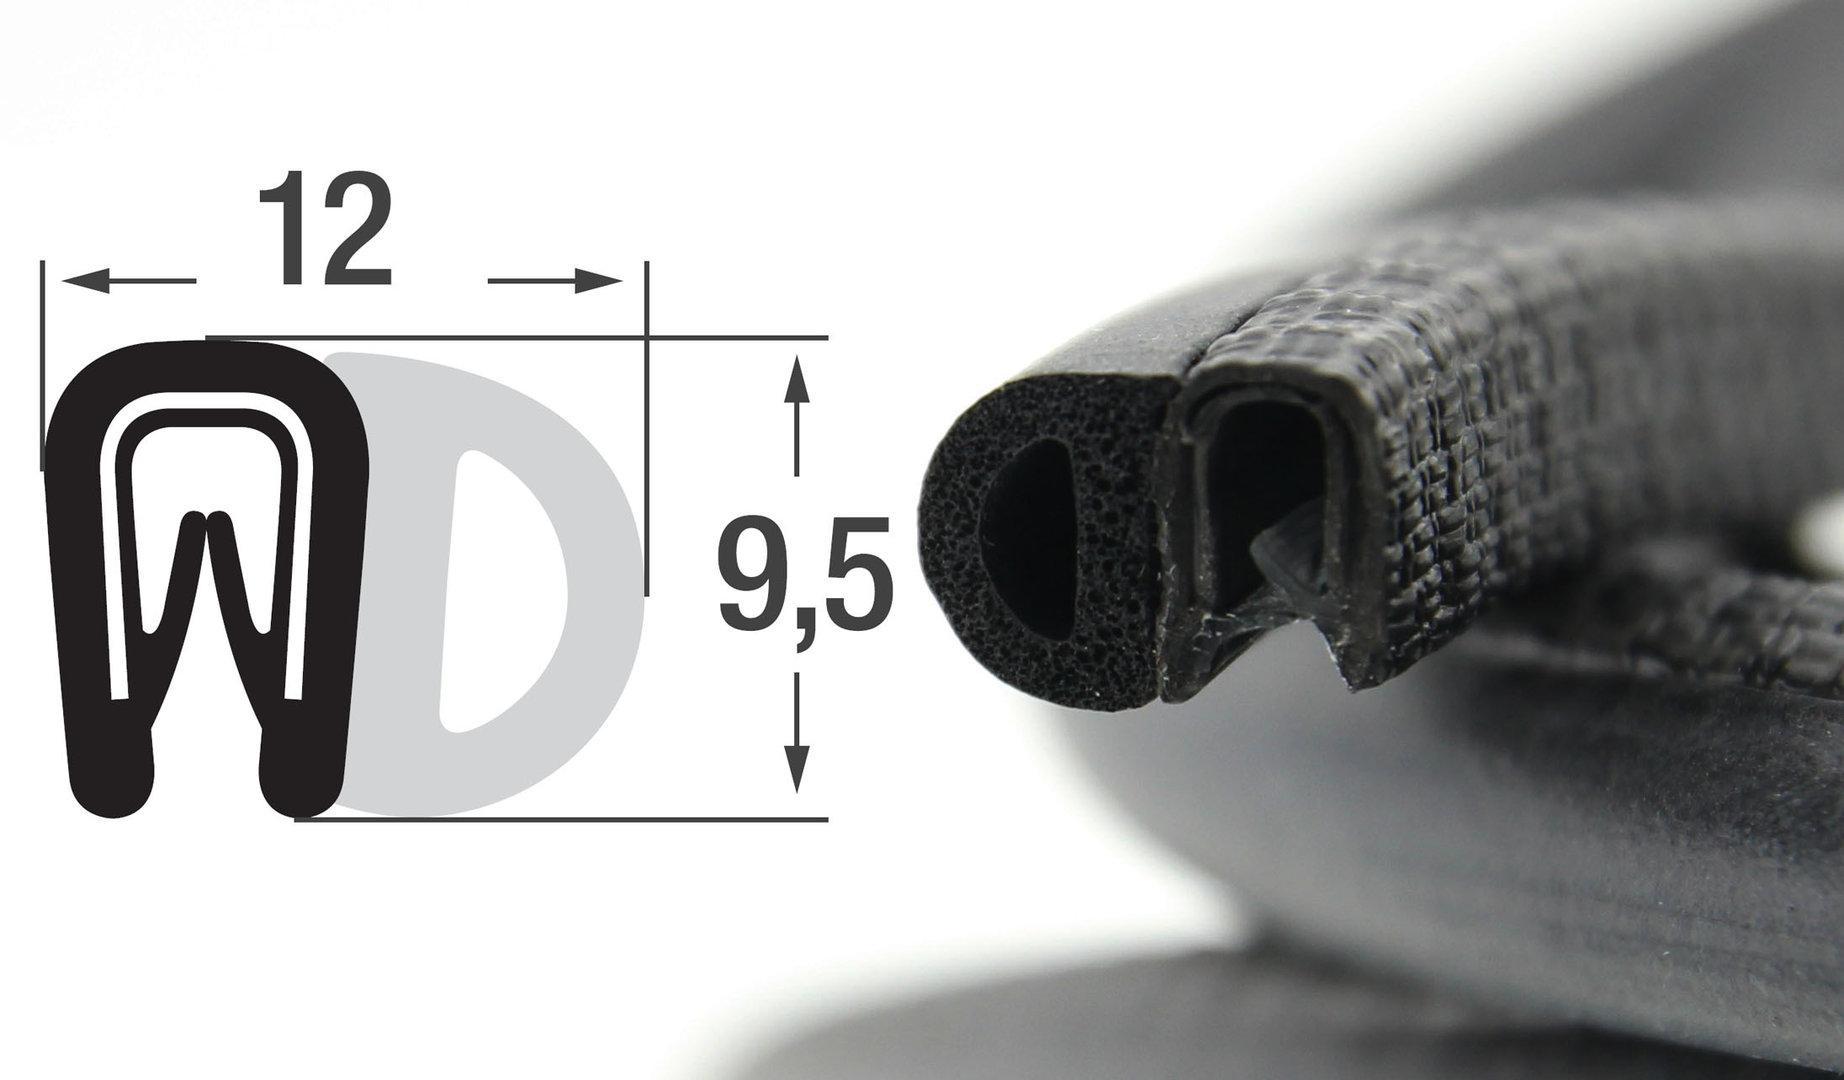 ds4 kantenschutzprofil dichtungsprofil pvc gummi epdm dichtung. Black Bedroom Furniture Sets. Home Design Ideas